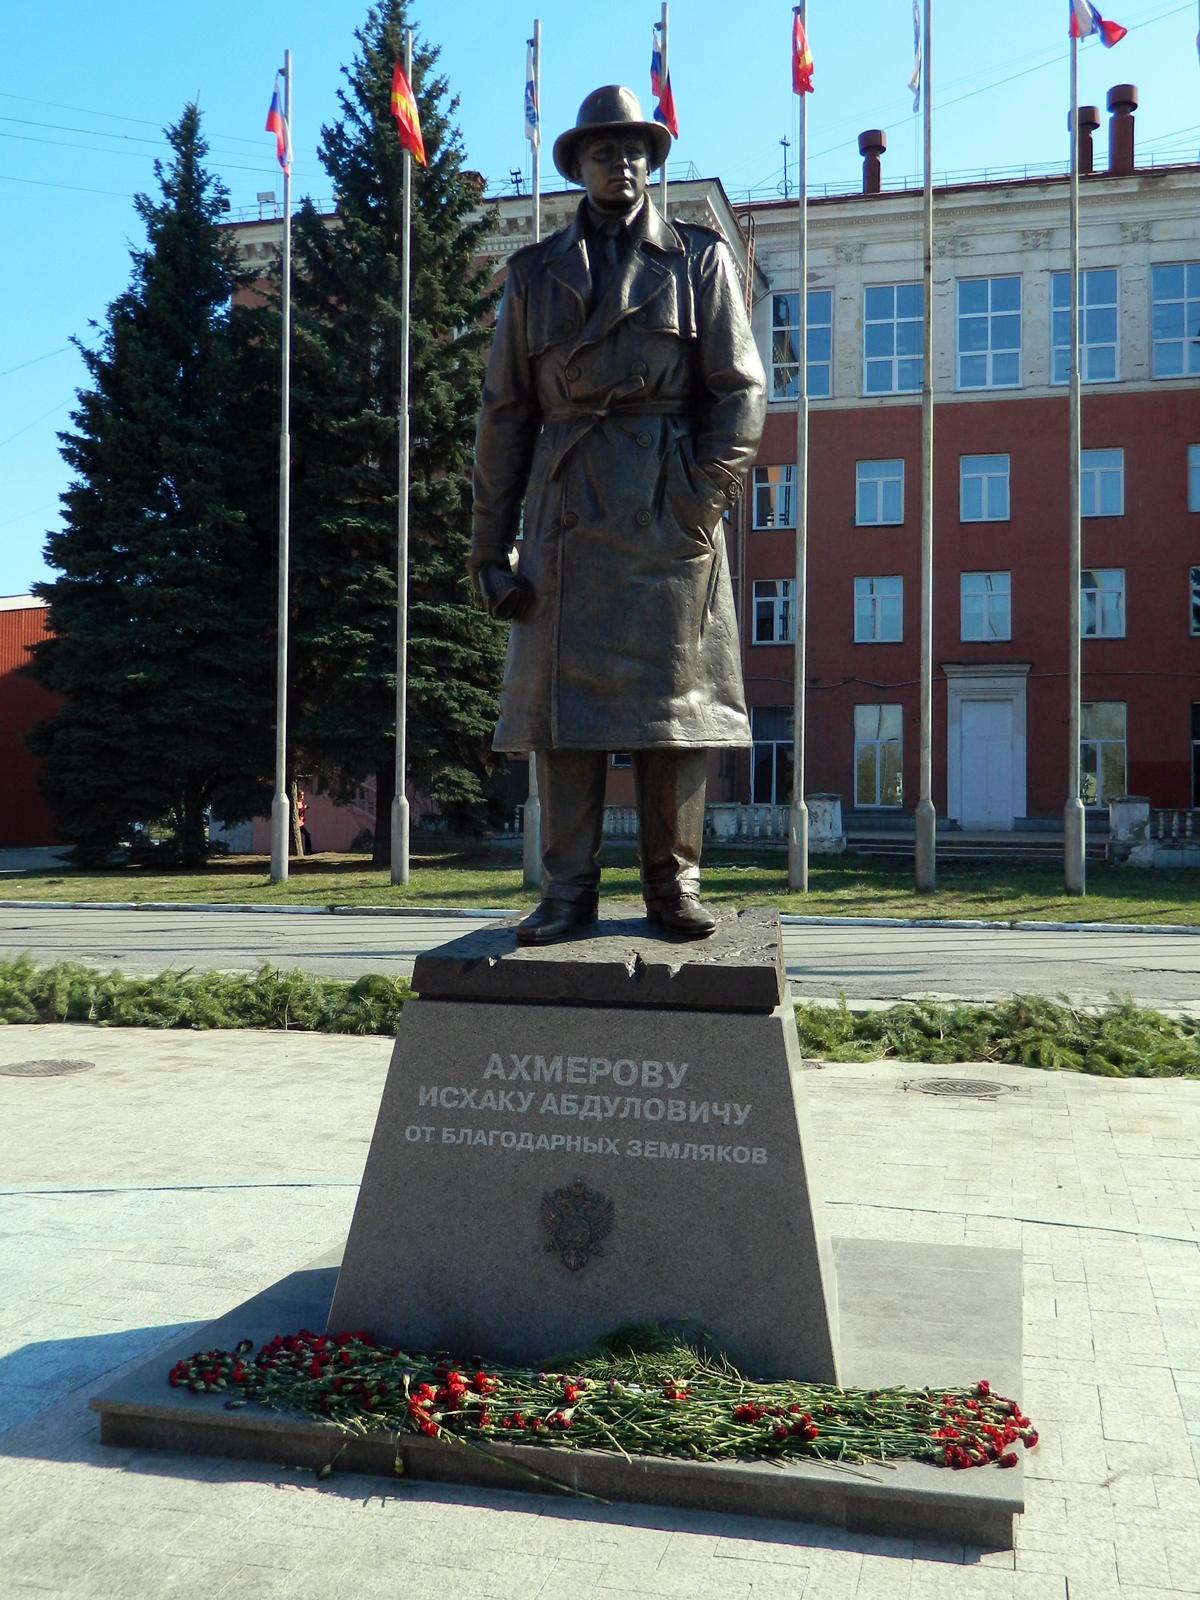 Цена на памятники в ярославле кирсанов памятники в ростове великом цена